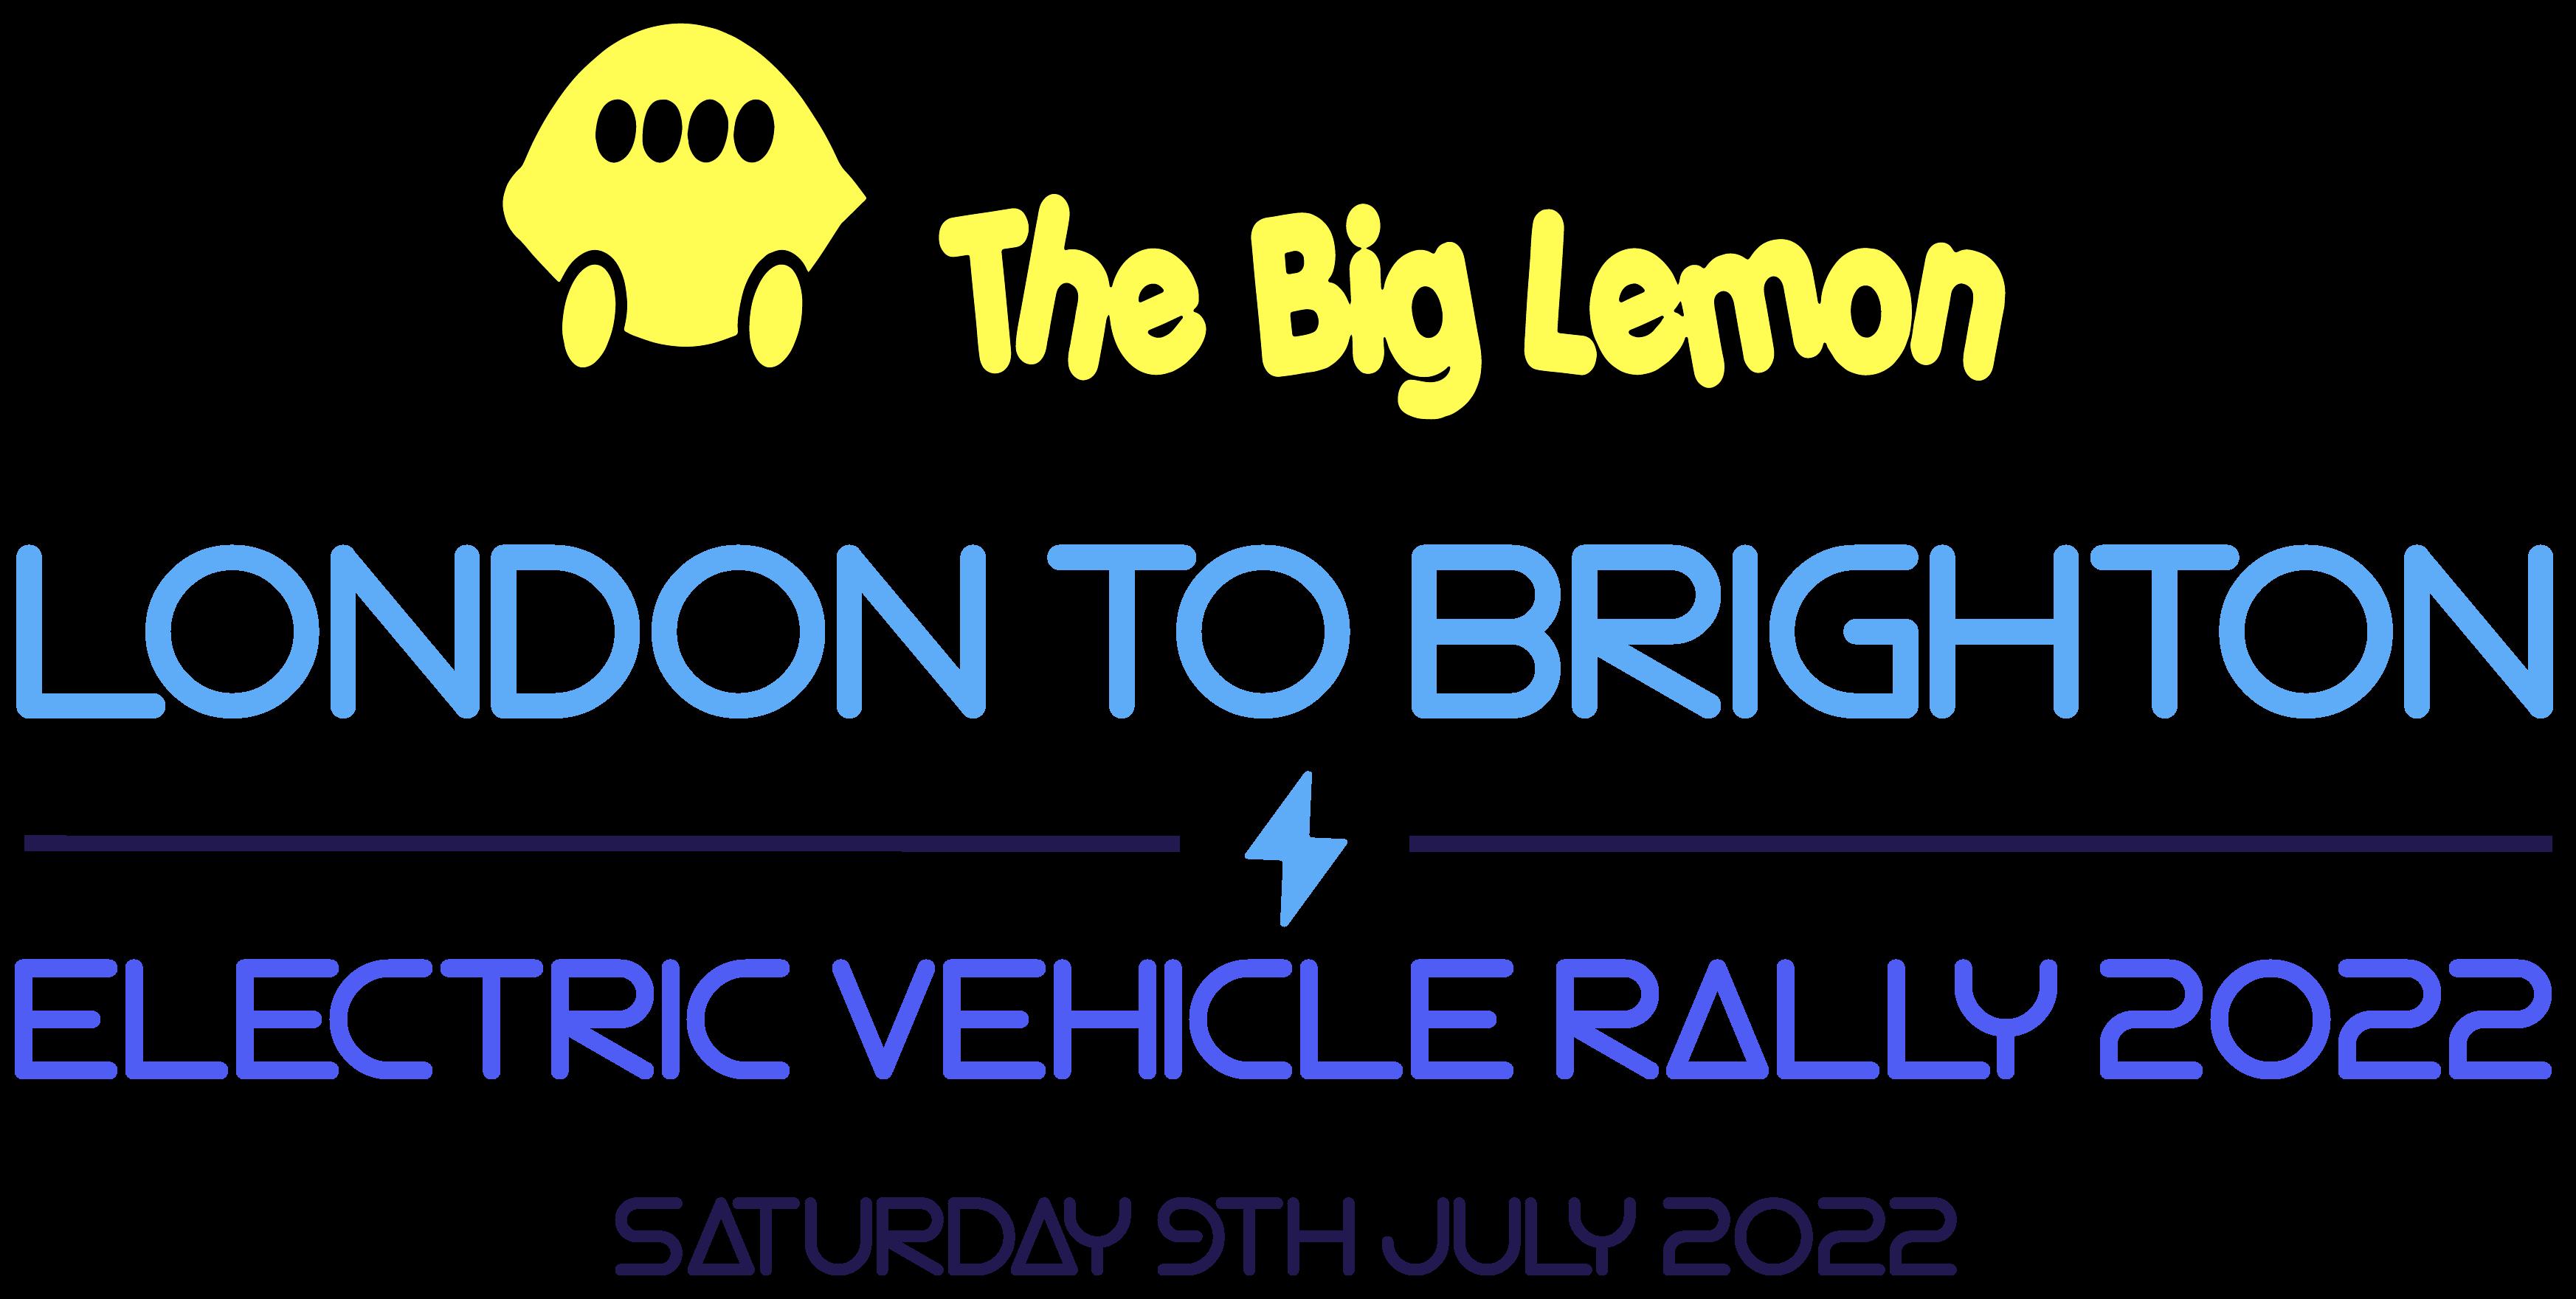 London to Brighton Electric Vehicle Rally